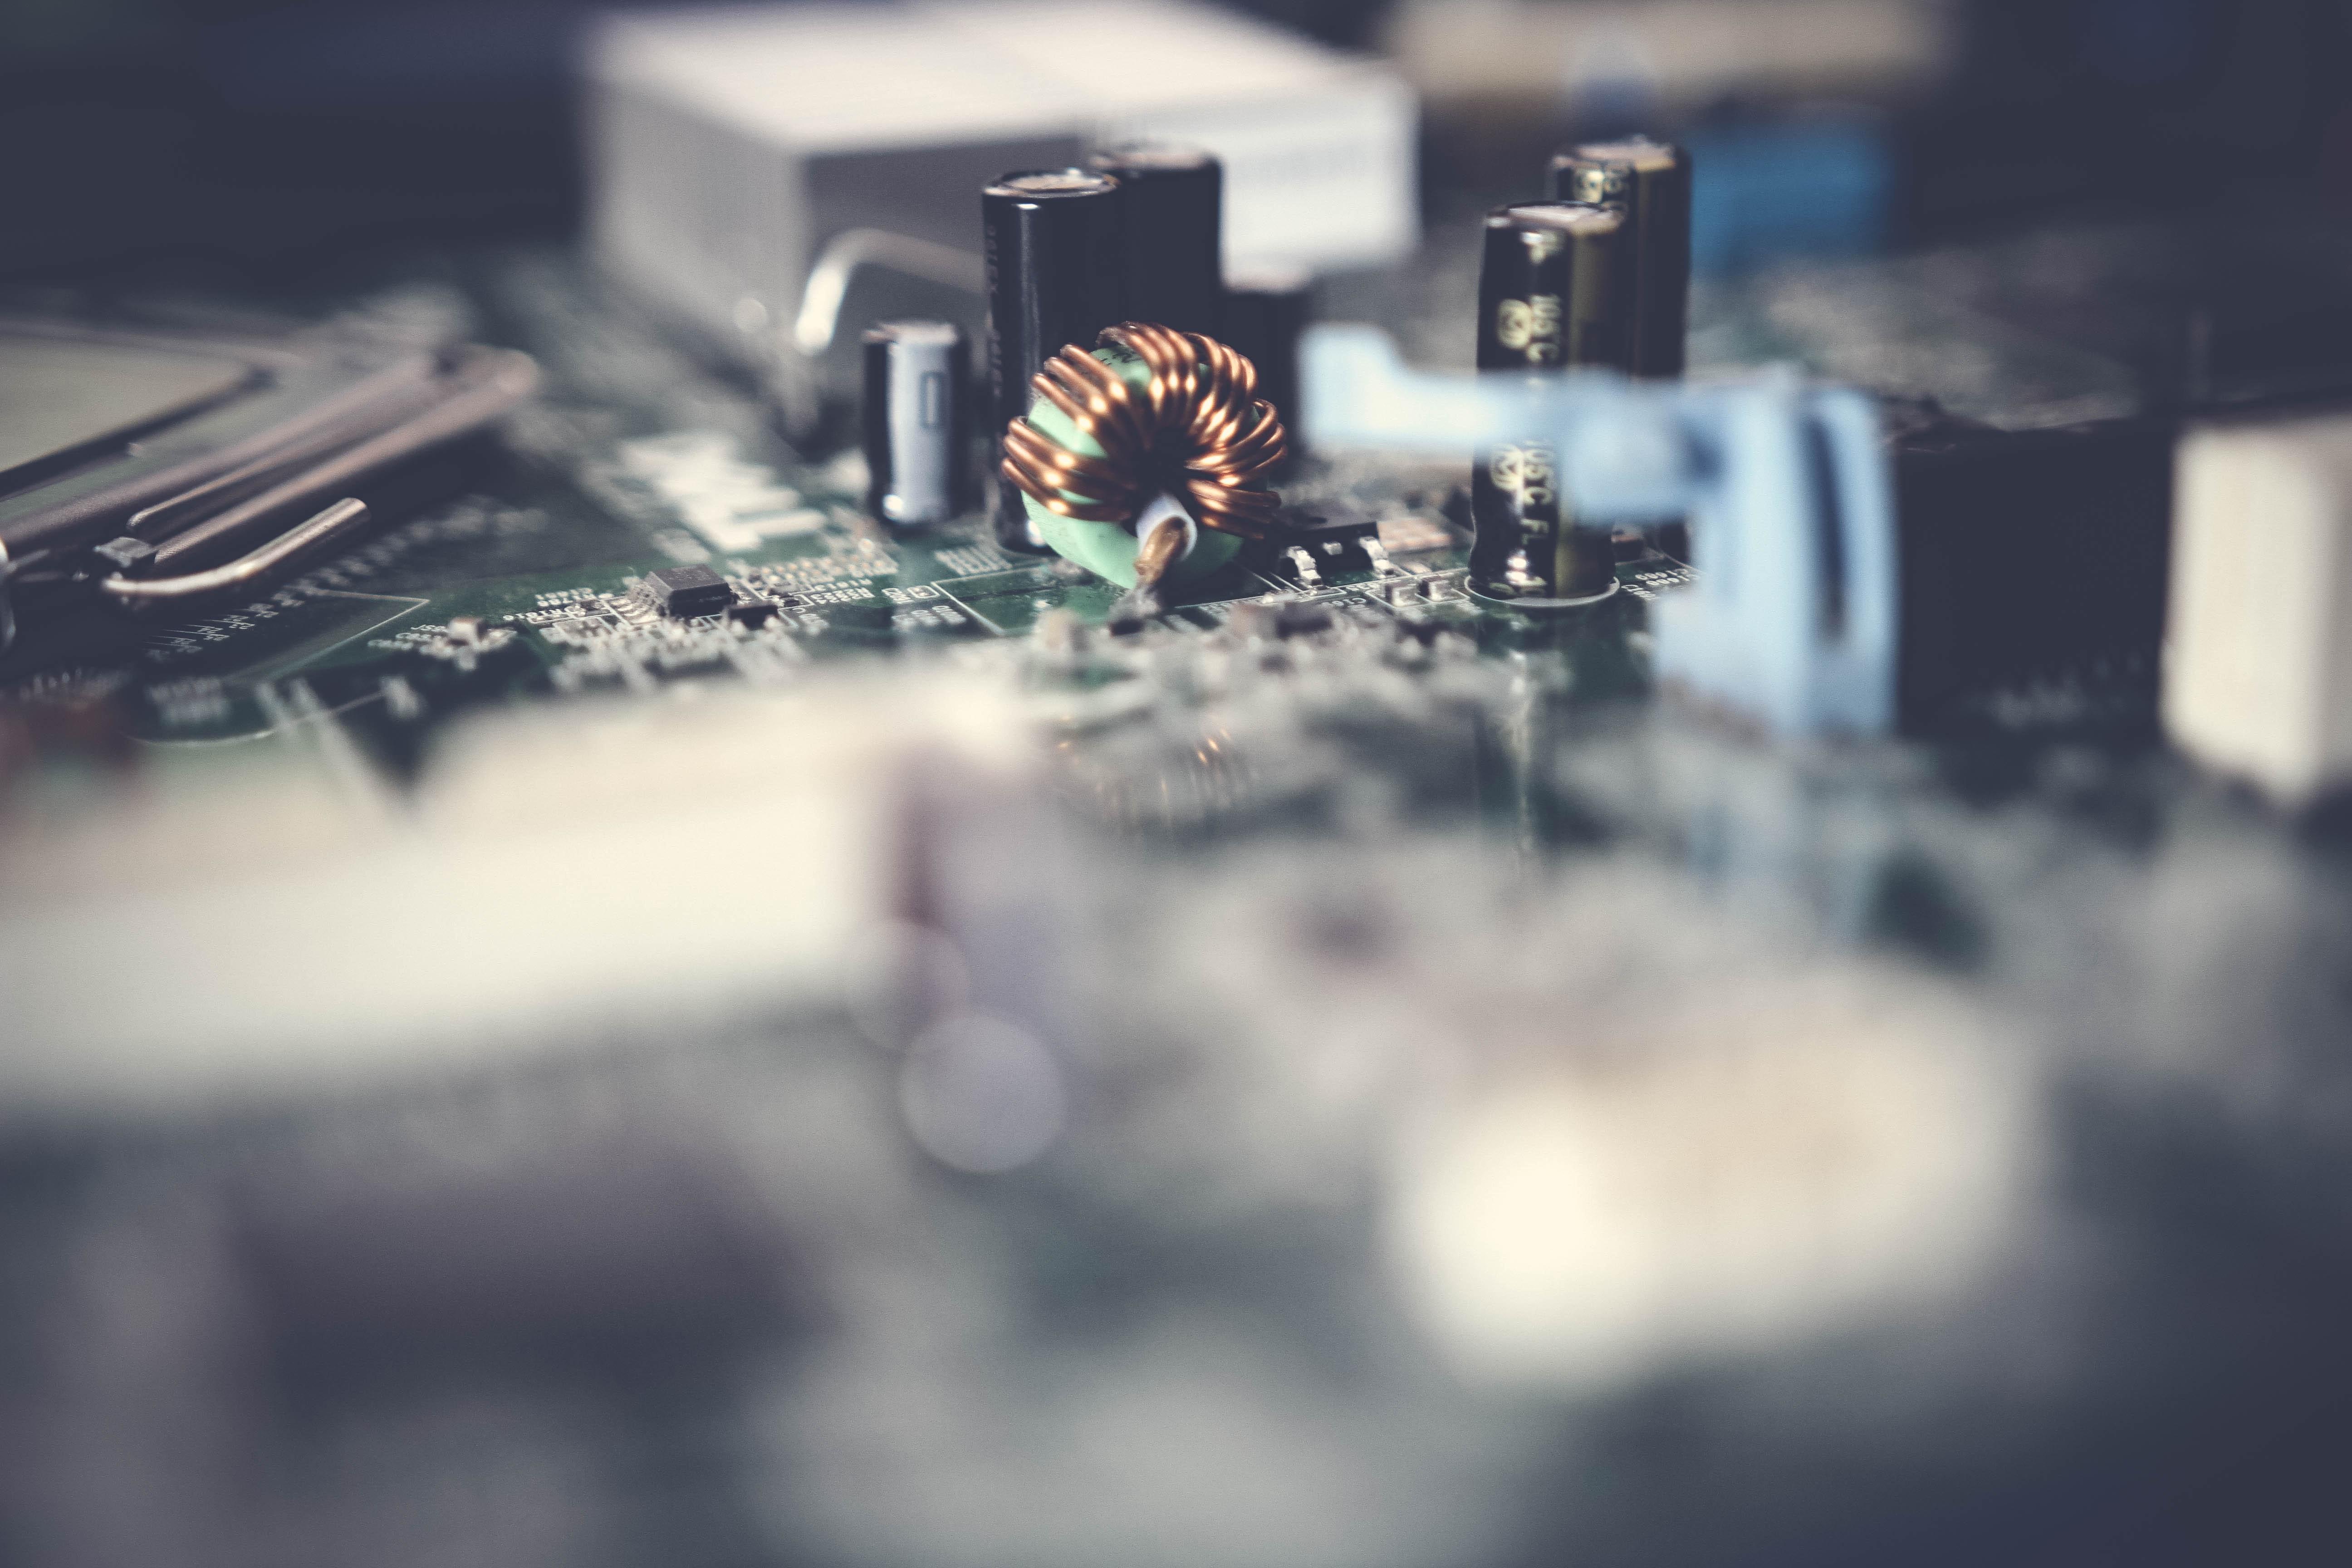 Computer Circuit Main Board Royalty Free Stock Photography Image